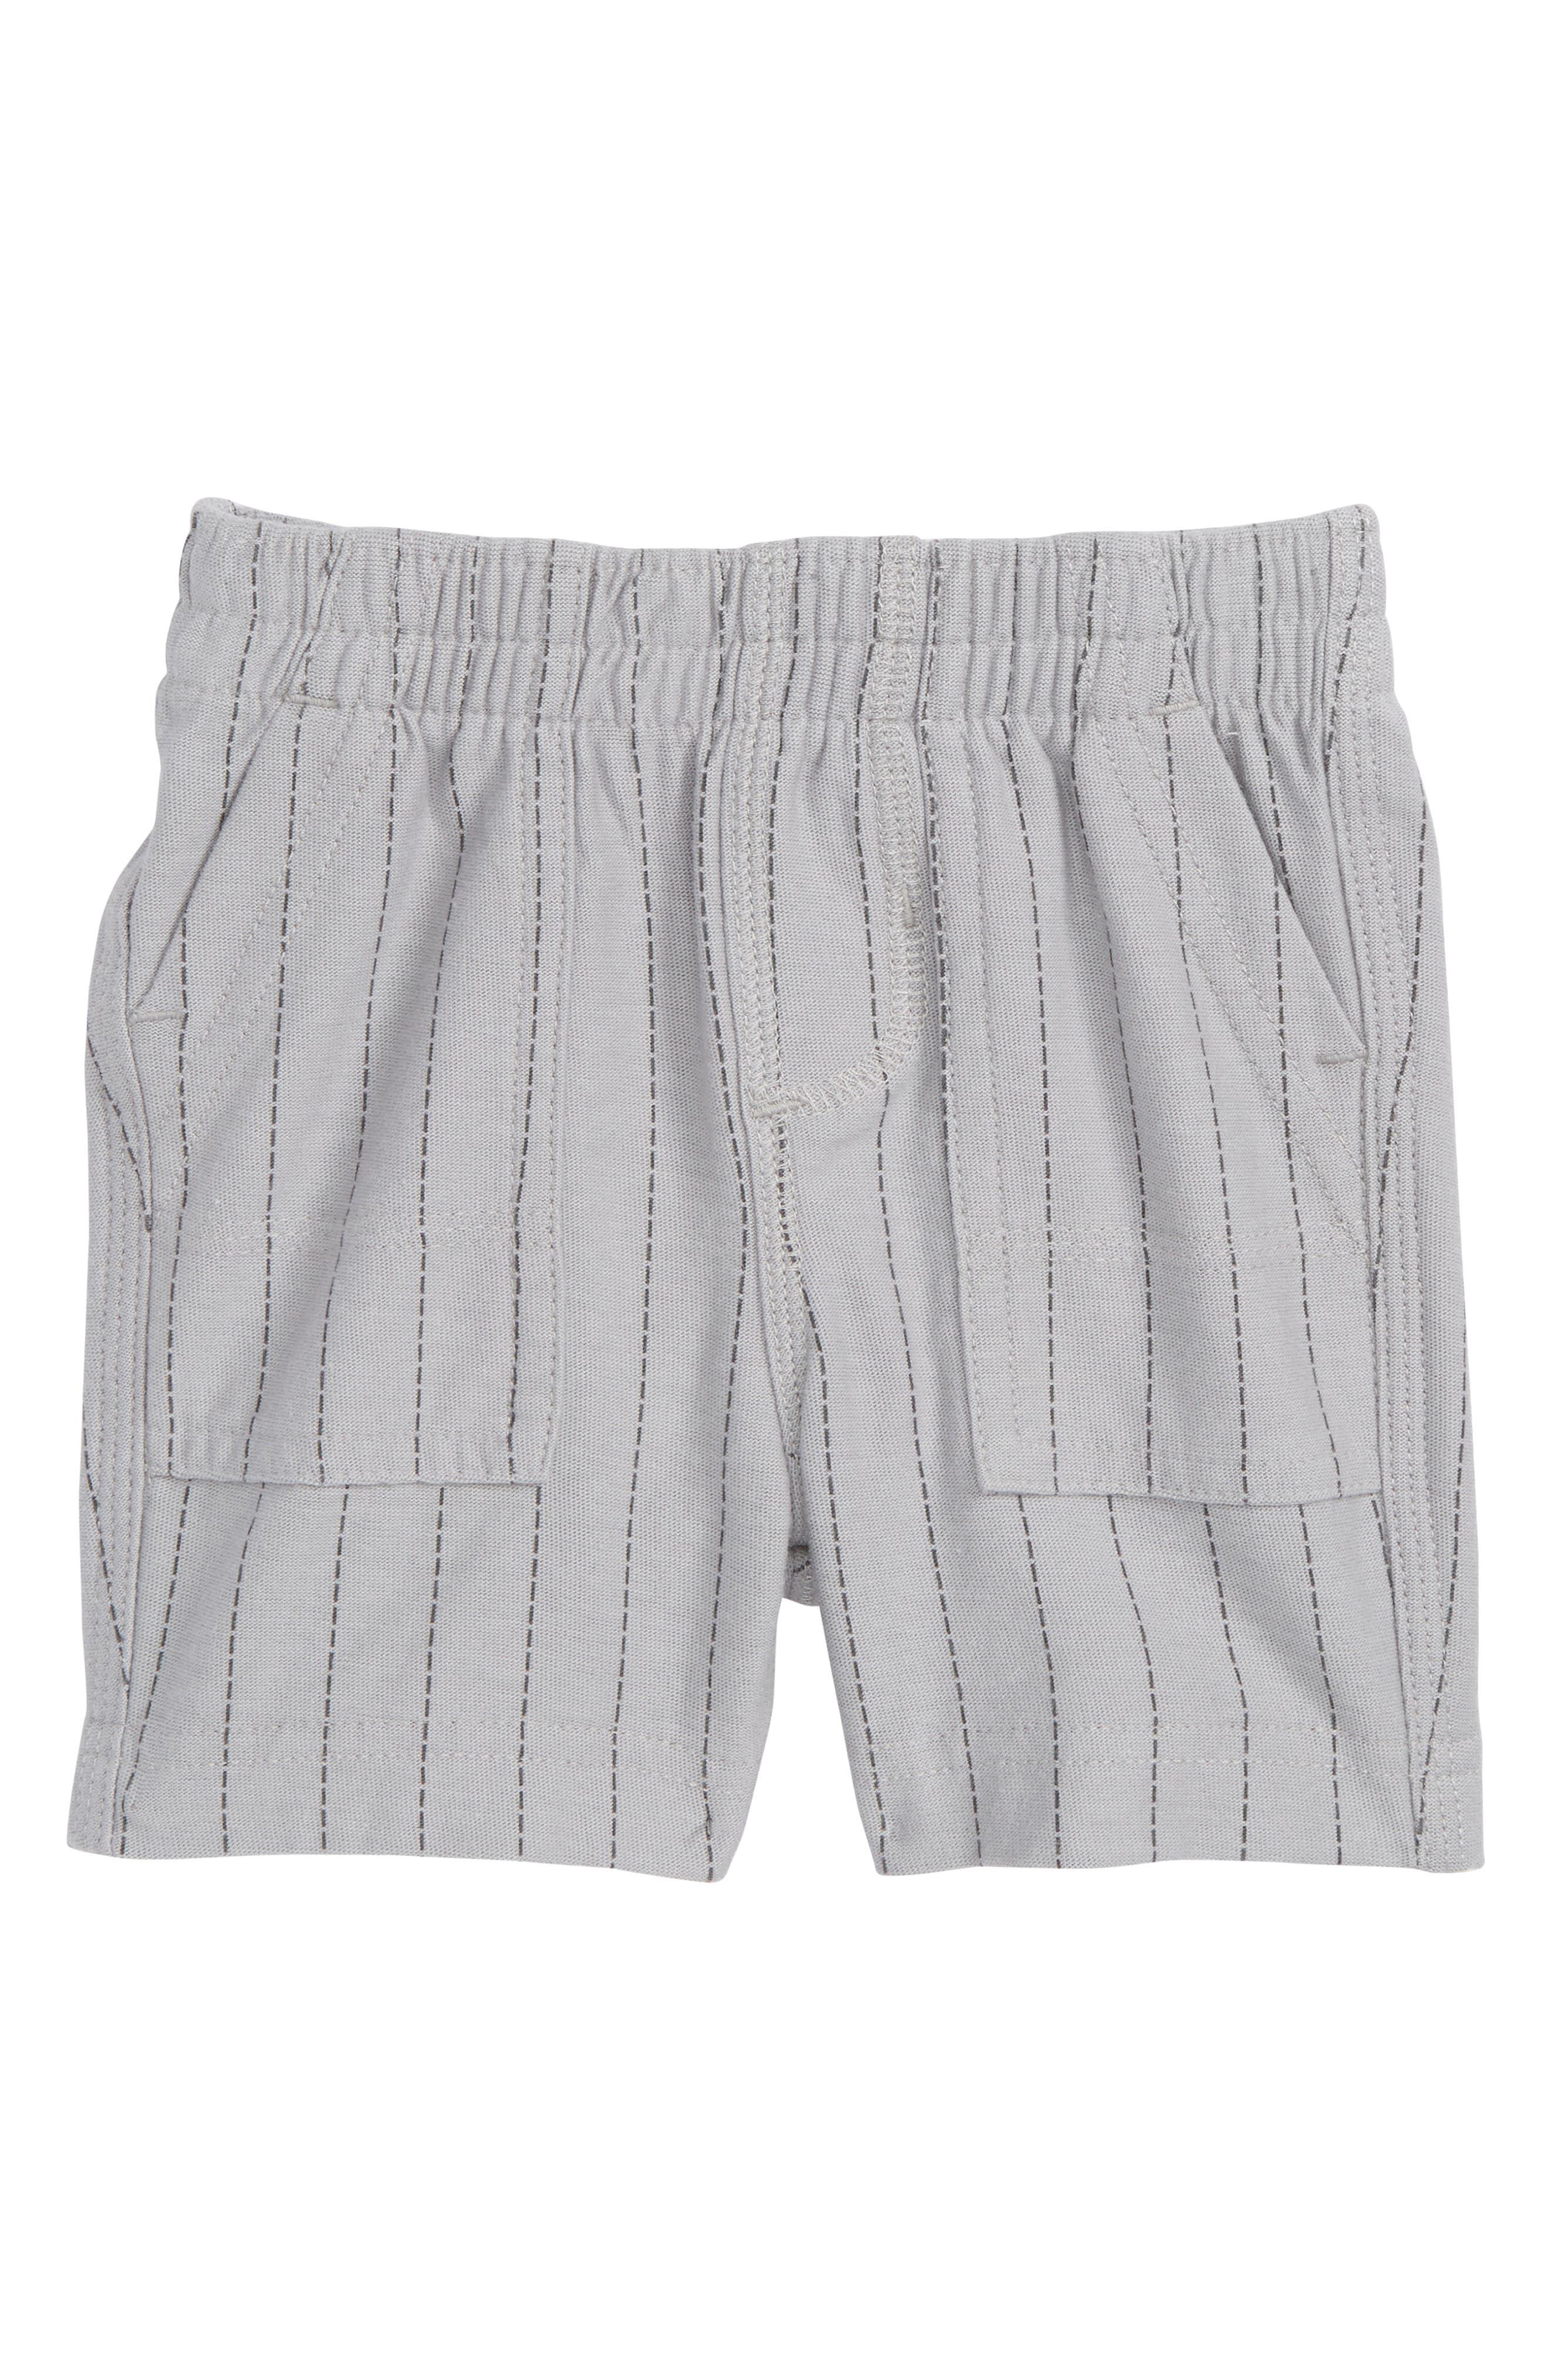 Stripe Shorts,                         Main,                         color, 052